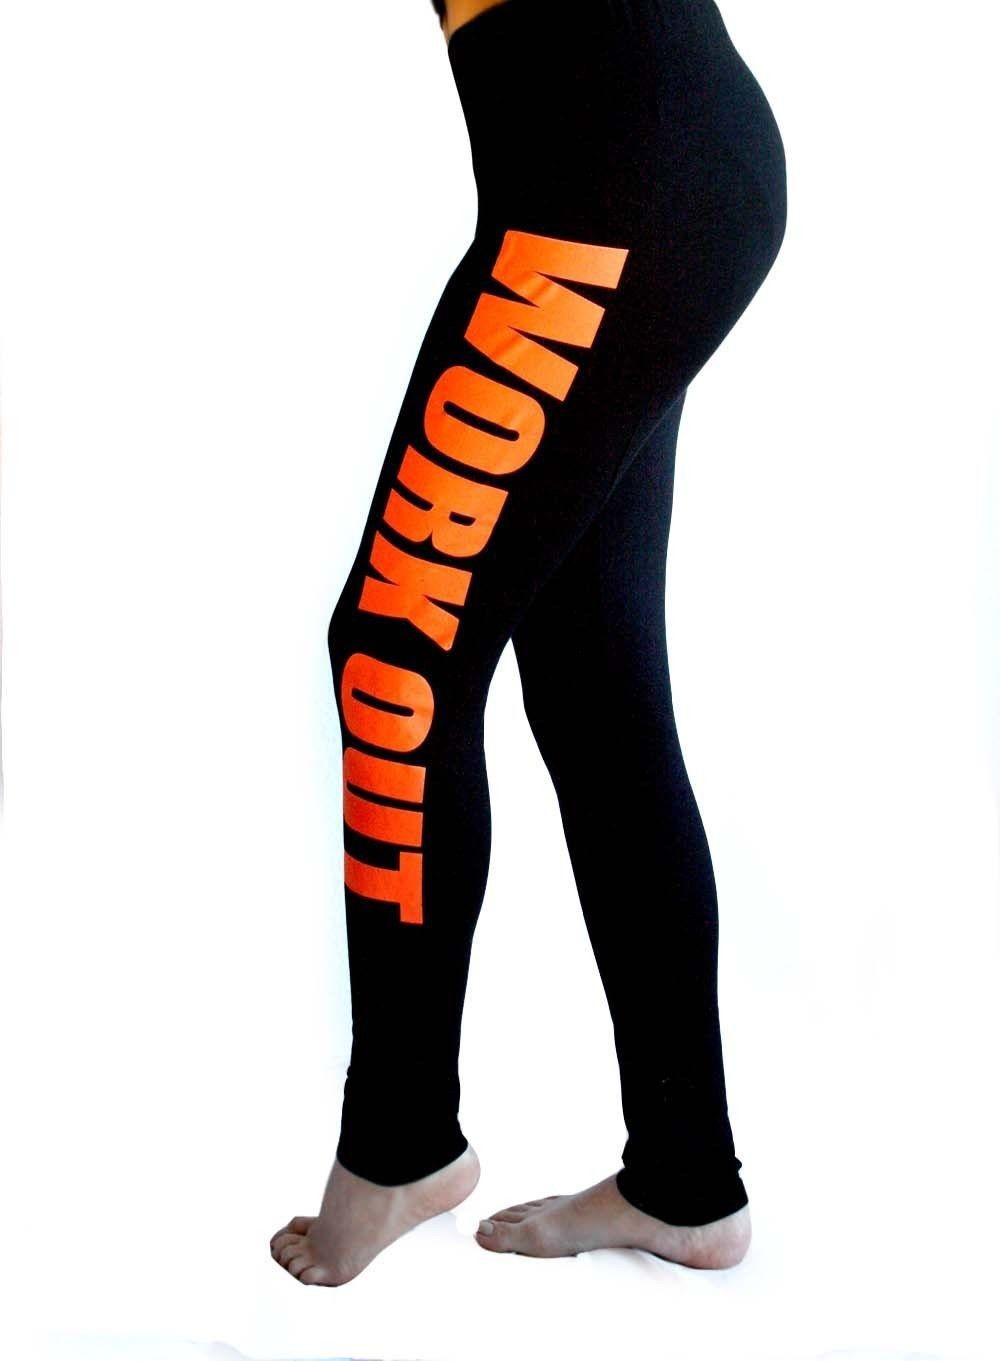 88af8205d1 KOSMO MASA 2017 Women Cotton Legging Pants Work out Printed Black ...